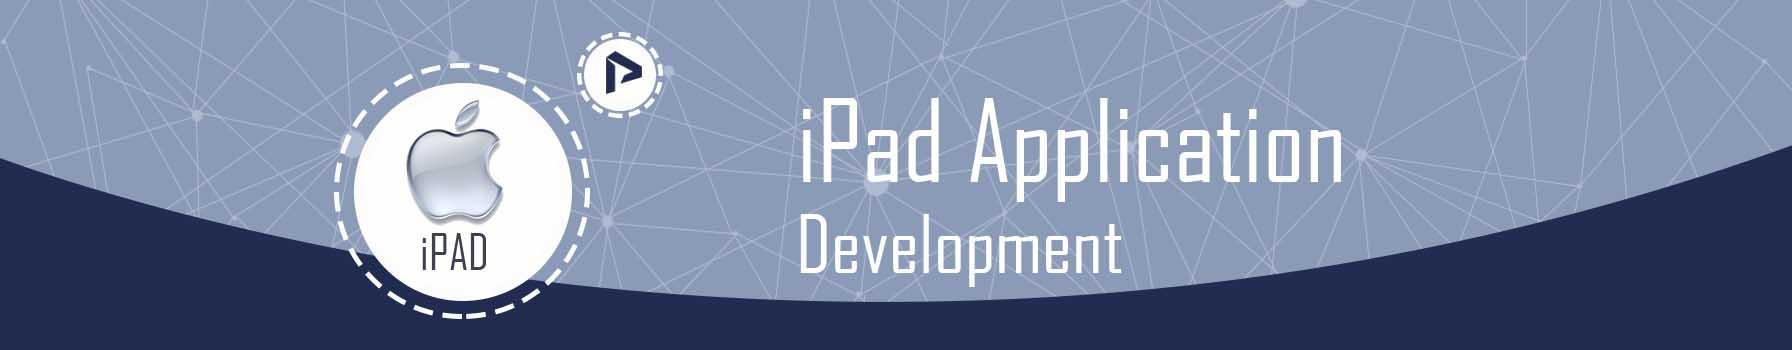 ipad-application-development.jpg